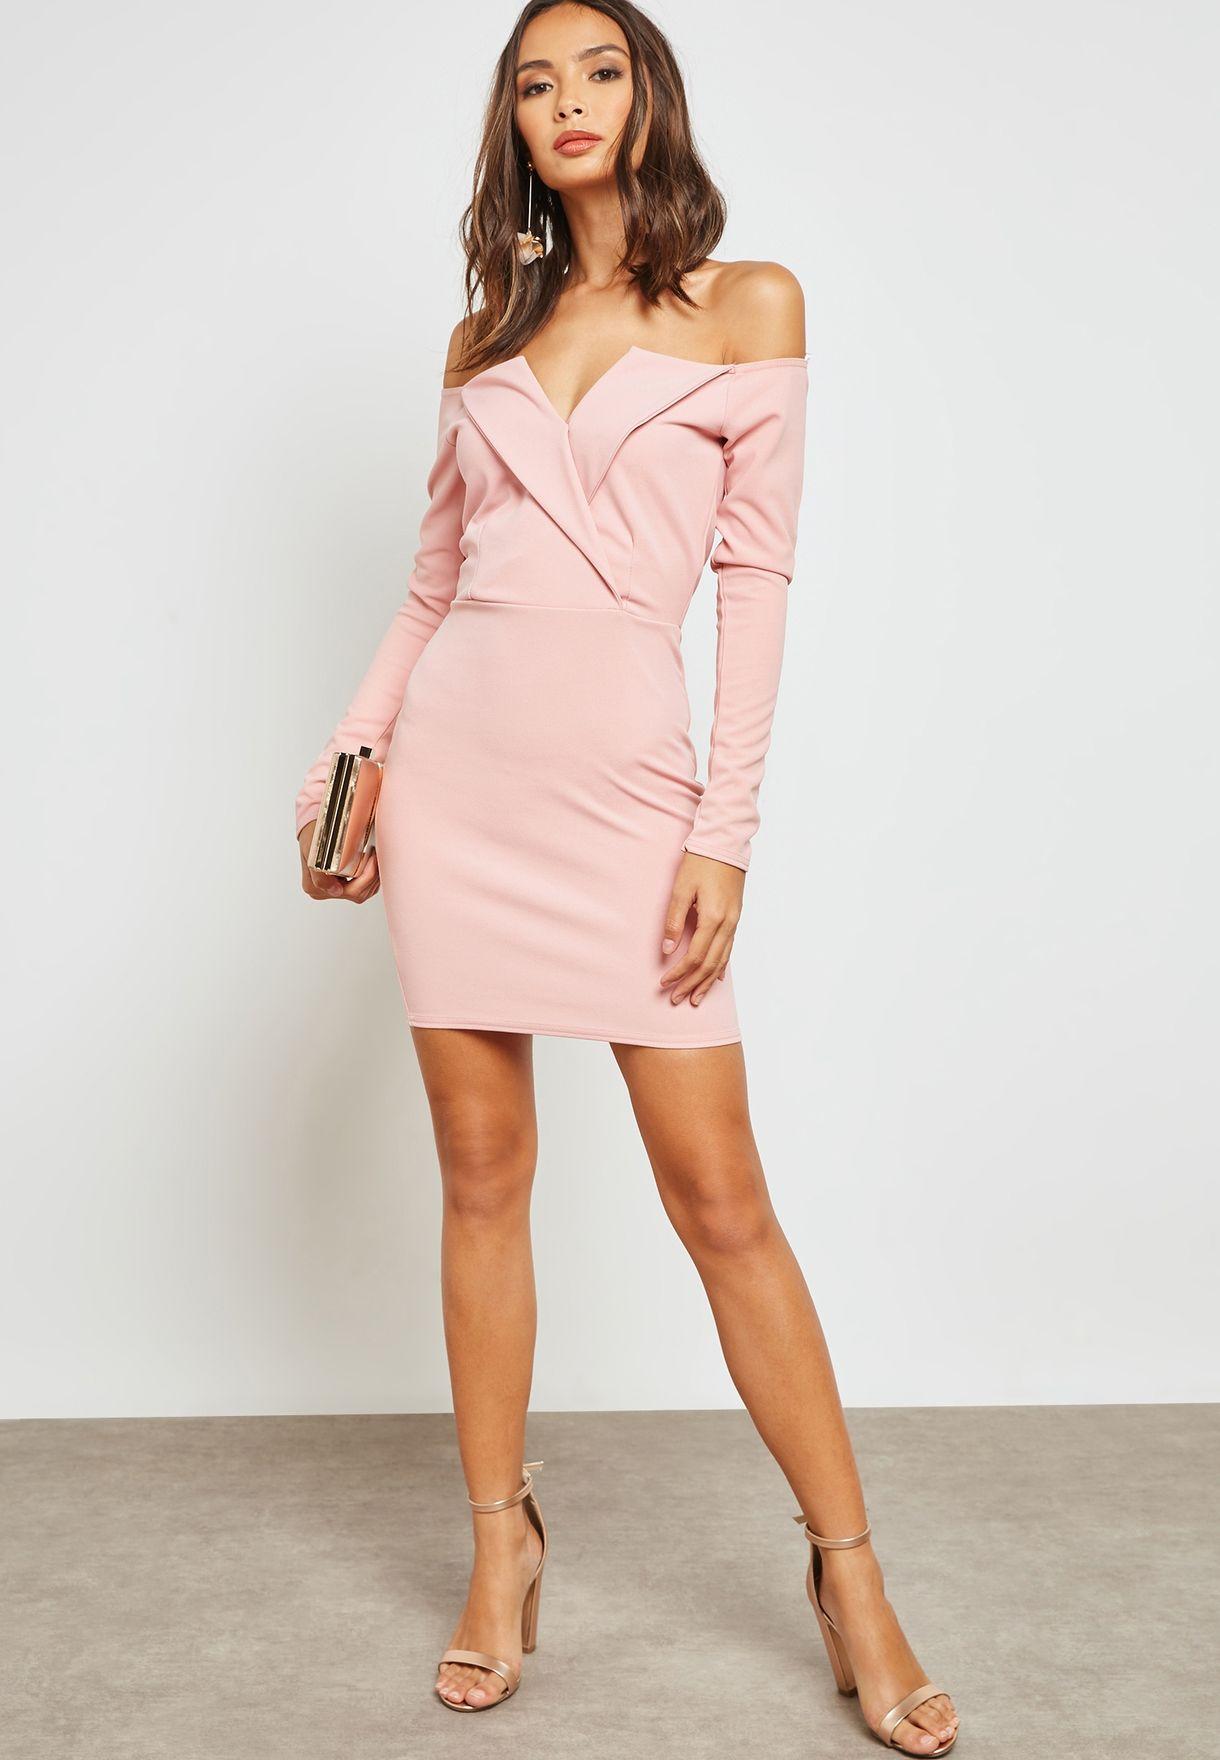 a63f1dbc6e77 Shop Missguided pink Bardot Foldover Wrap Dress DE914831 for Women ...